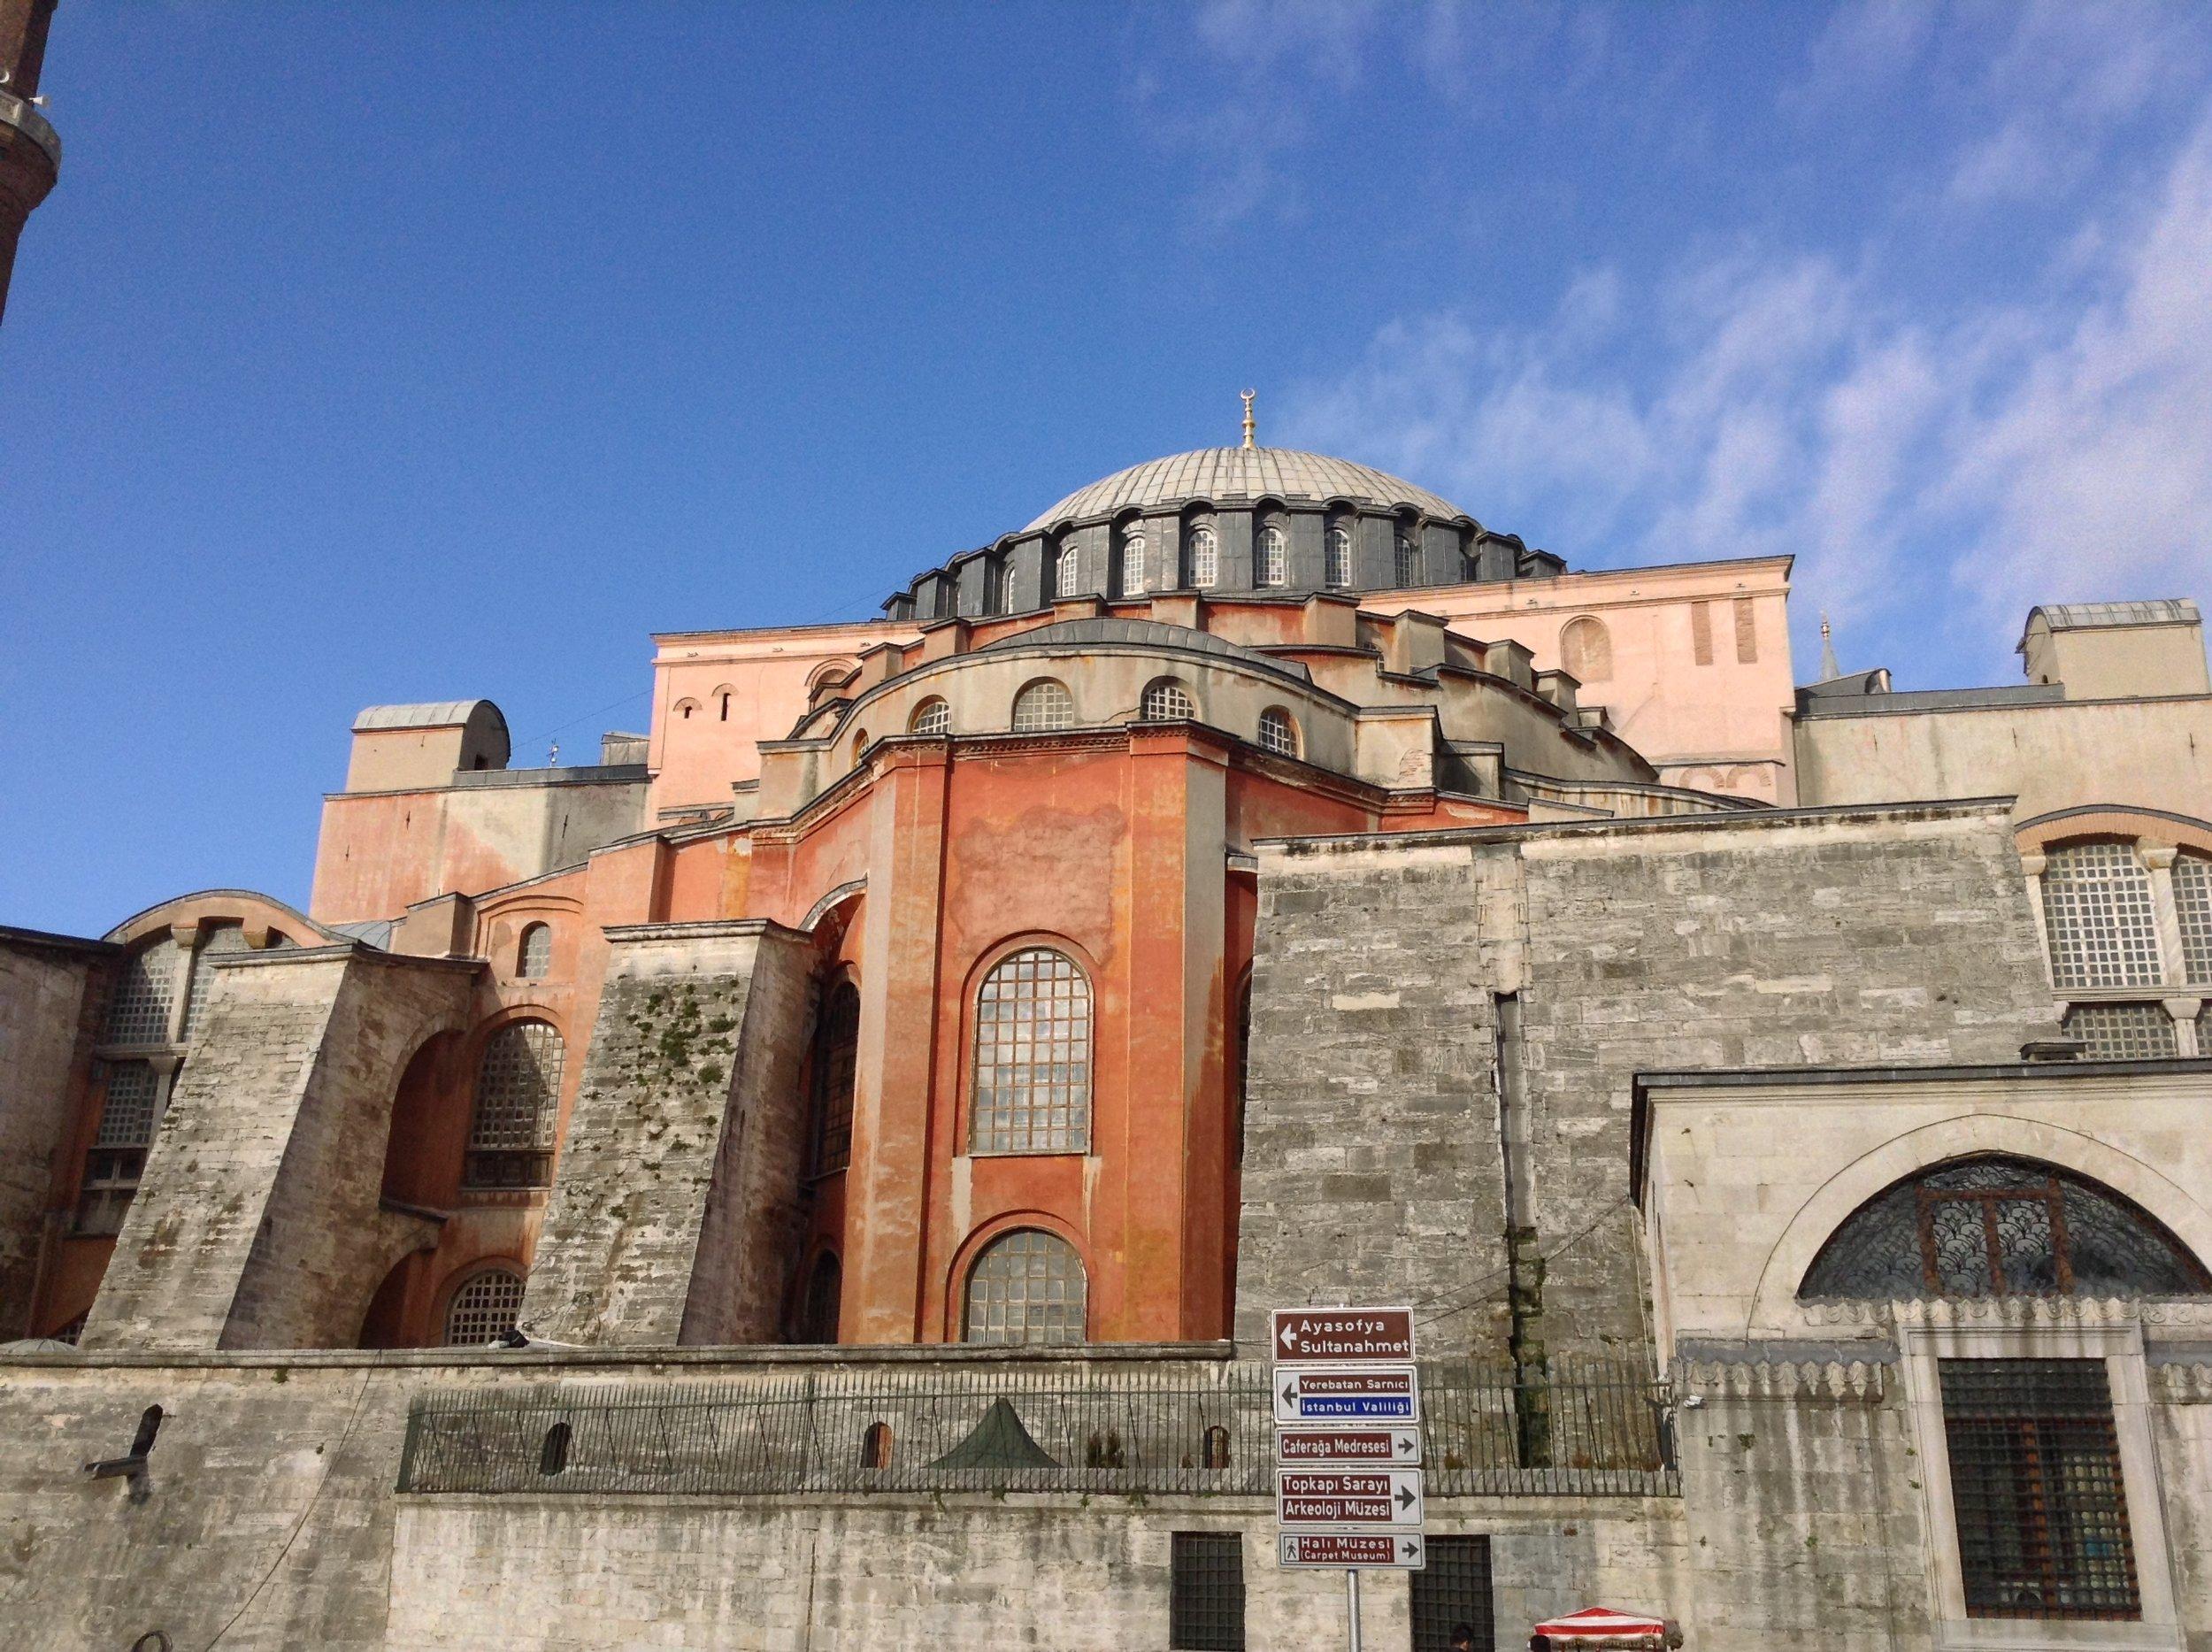 The Hagia Sophia (photo by the author).